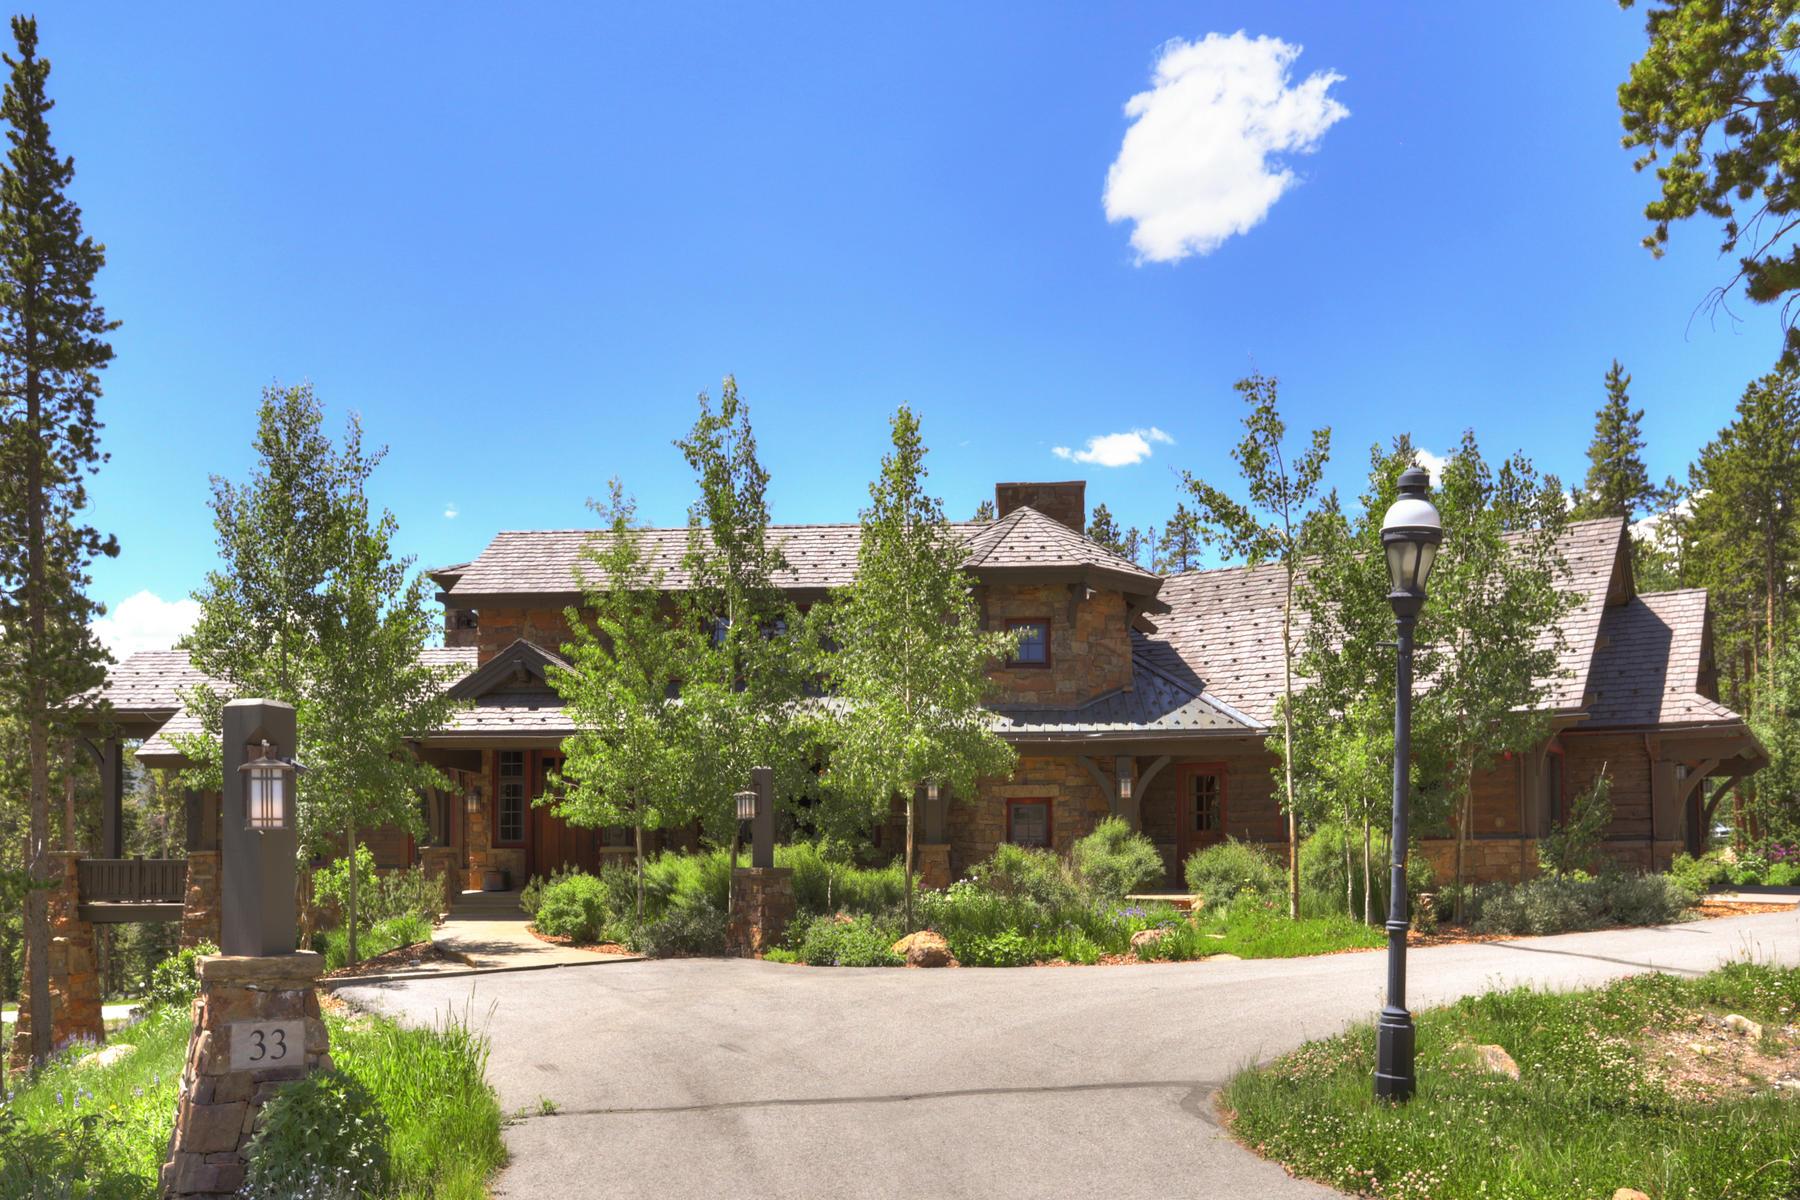 Single Family Homes για την Πώληση στο A One of a Kind Breckenridge Estate 33 Iron Mask Road, Breckenridge, Κολοραντο 80424 Ηνωμένες Πολιτείες